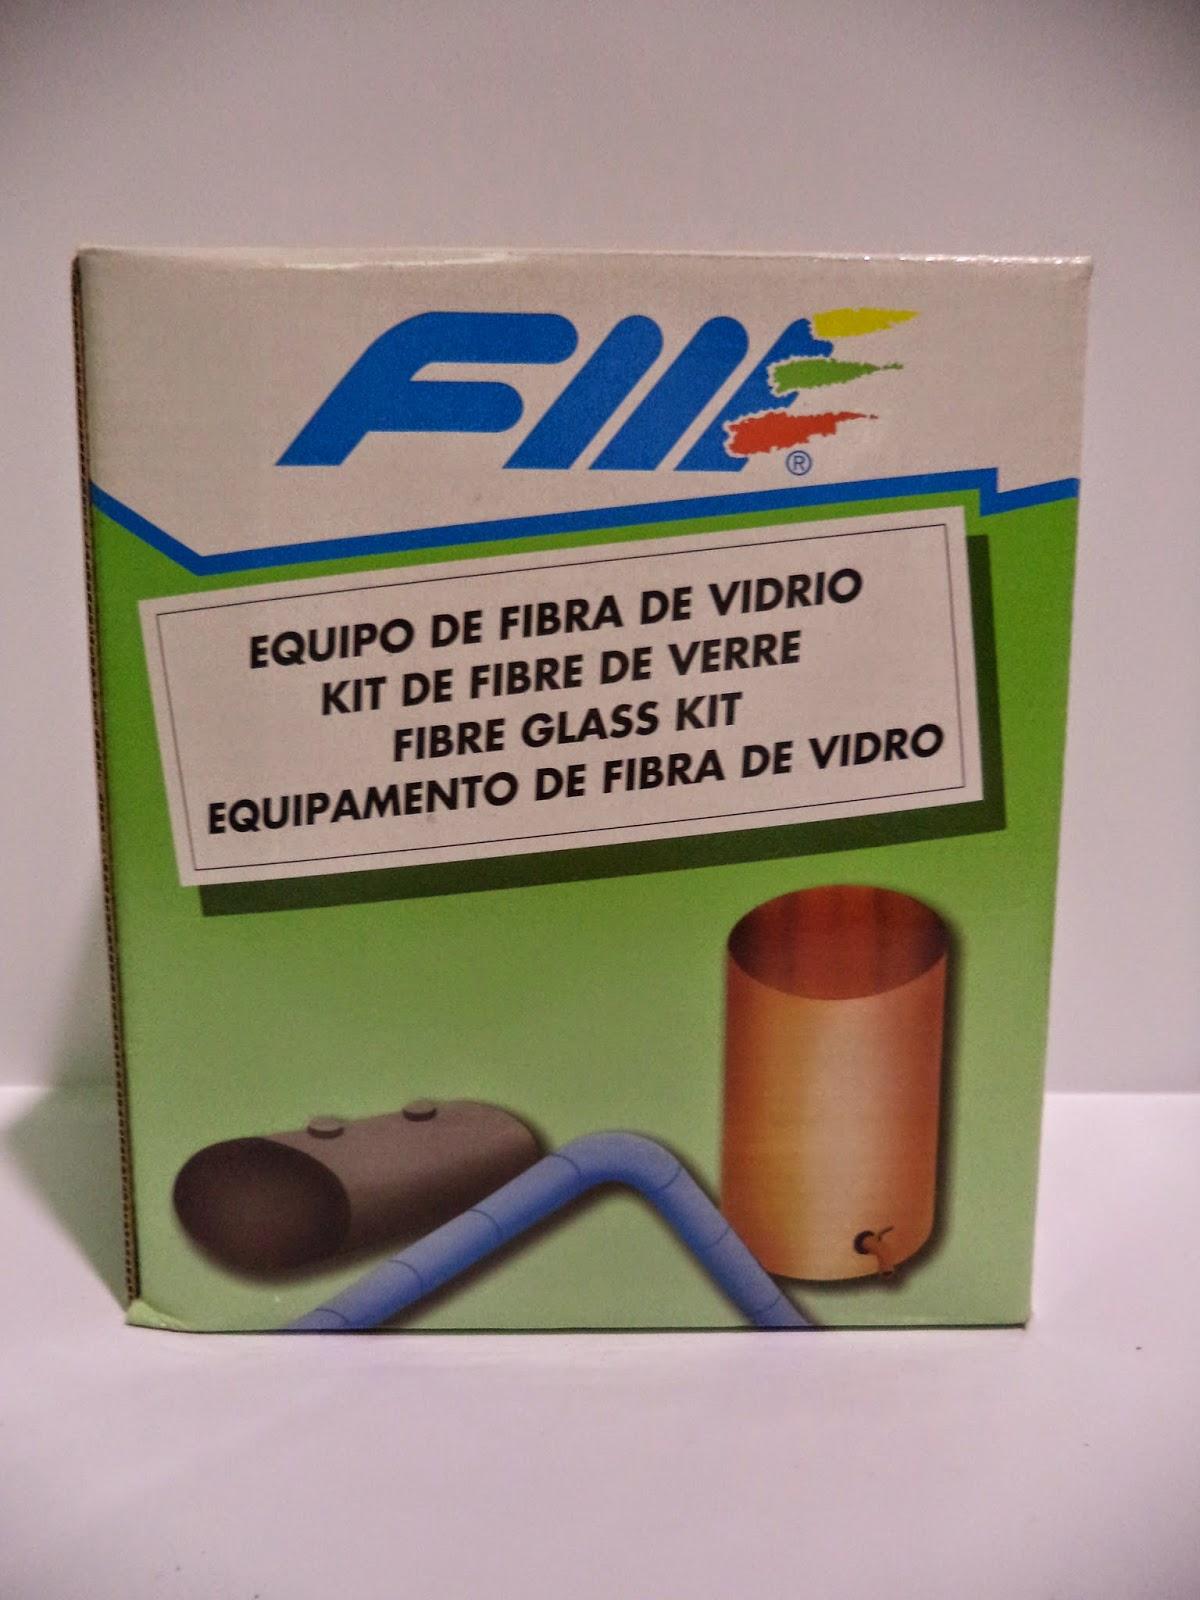 Hiperpinturas resinas de polyester fibra de vidrio y - Masilla de fibra de vidrio ...